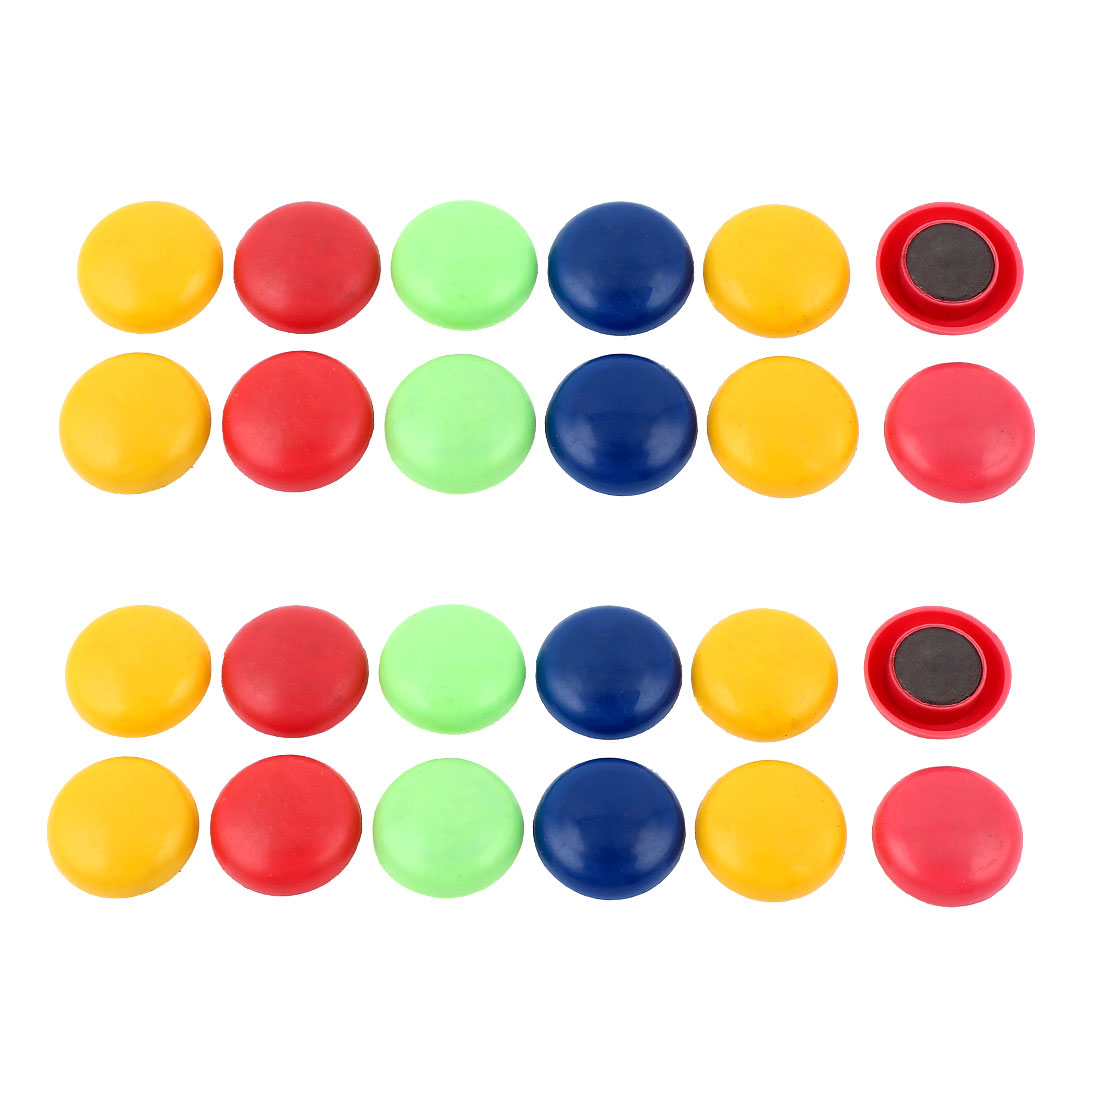 2 Set Multicolor Plastic 3cm Dia Cover Washing Machine Fridge Magnets